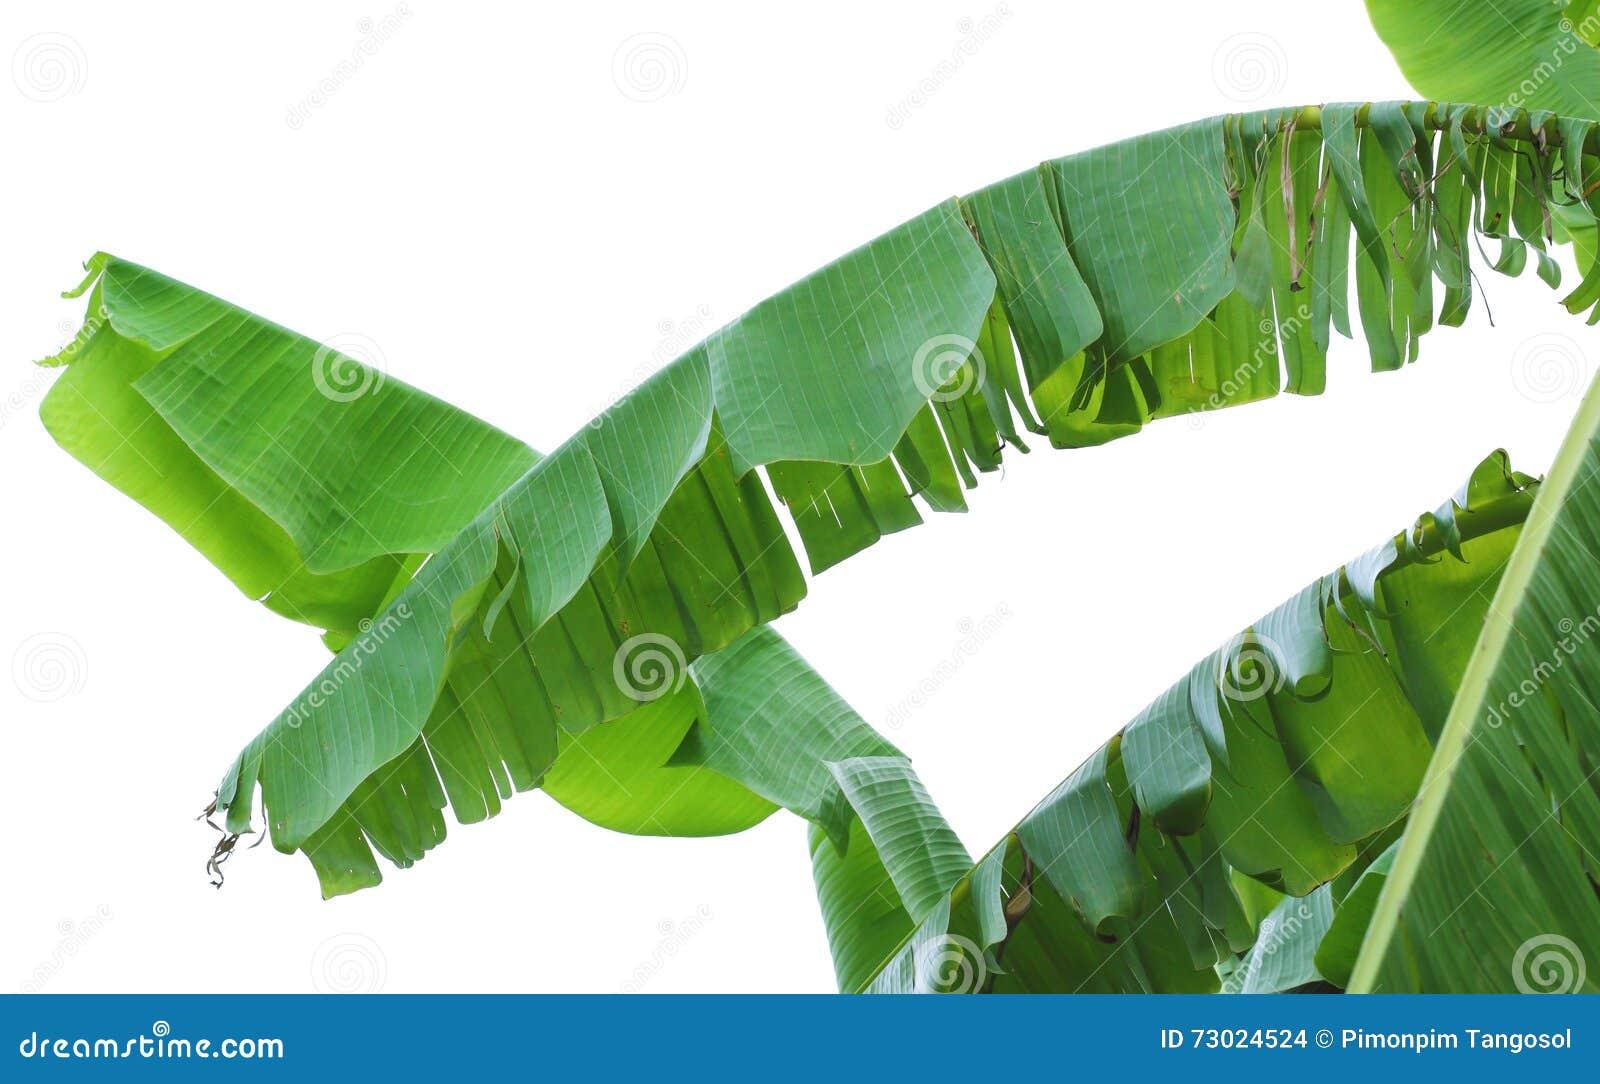 banana leaves or banana tree stock photo image 73024524